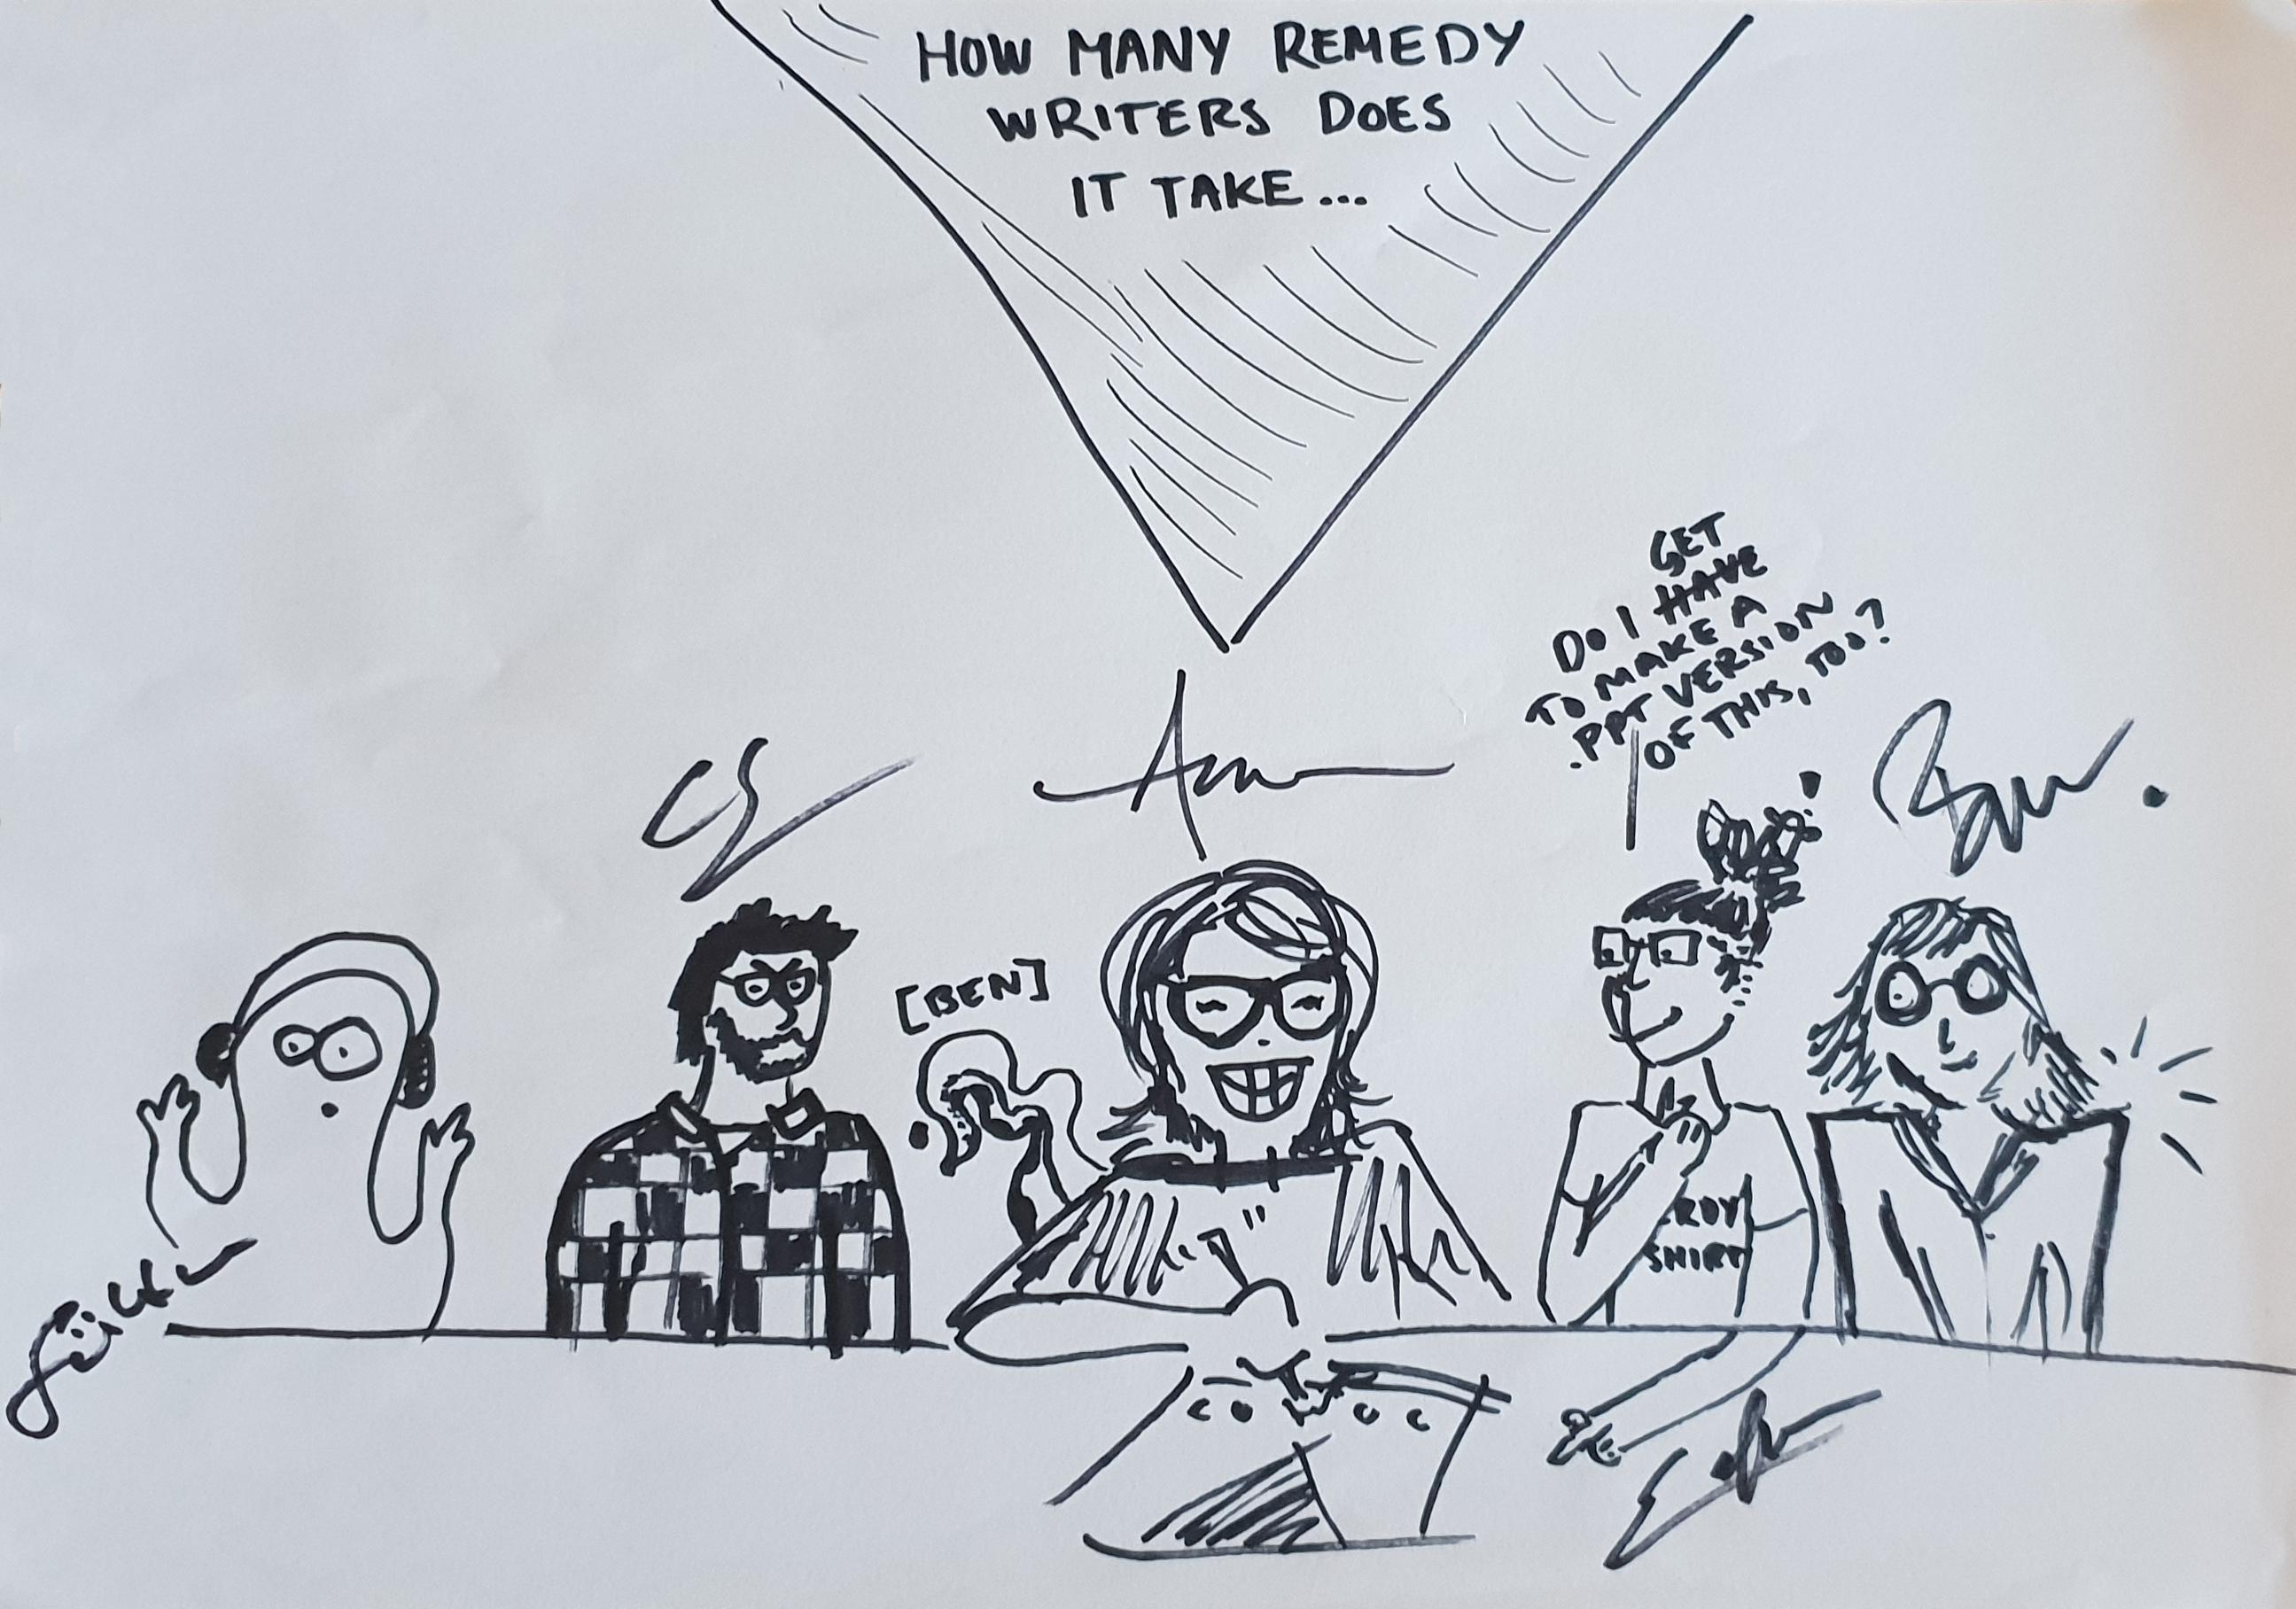 Remedy Writers Doodle.jpg